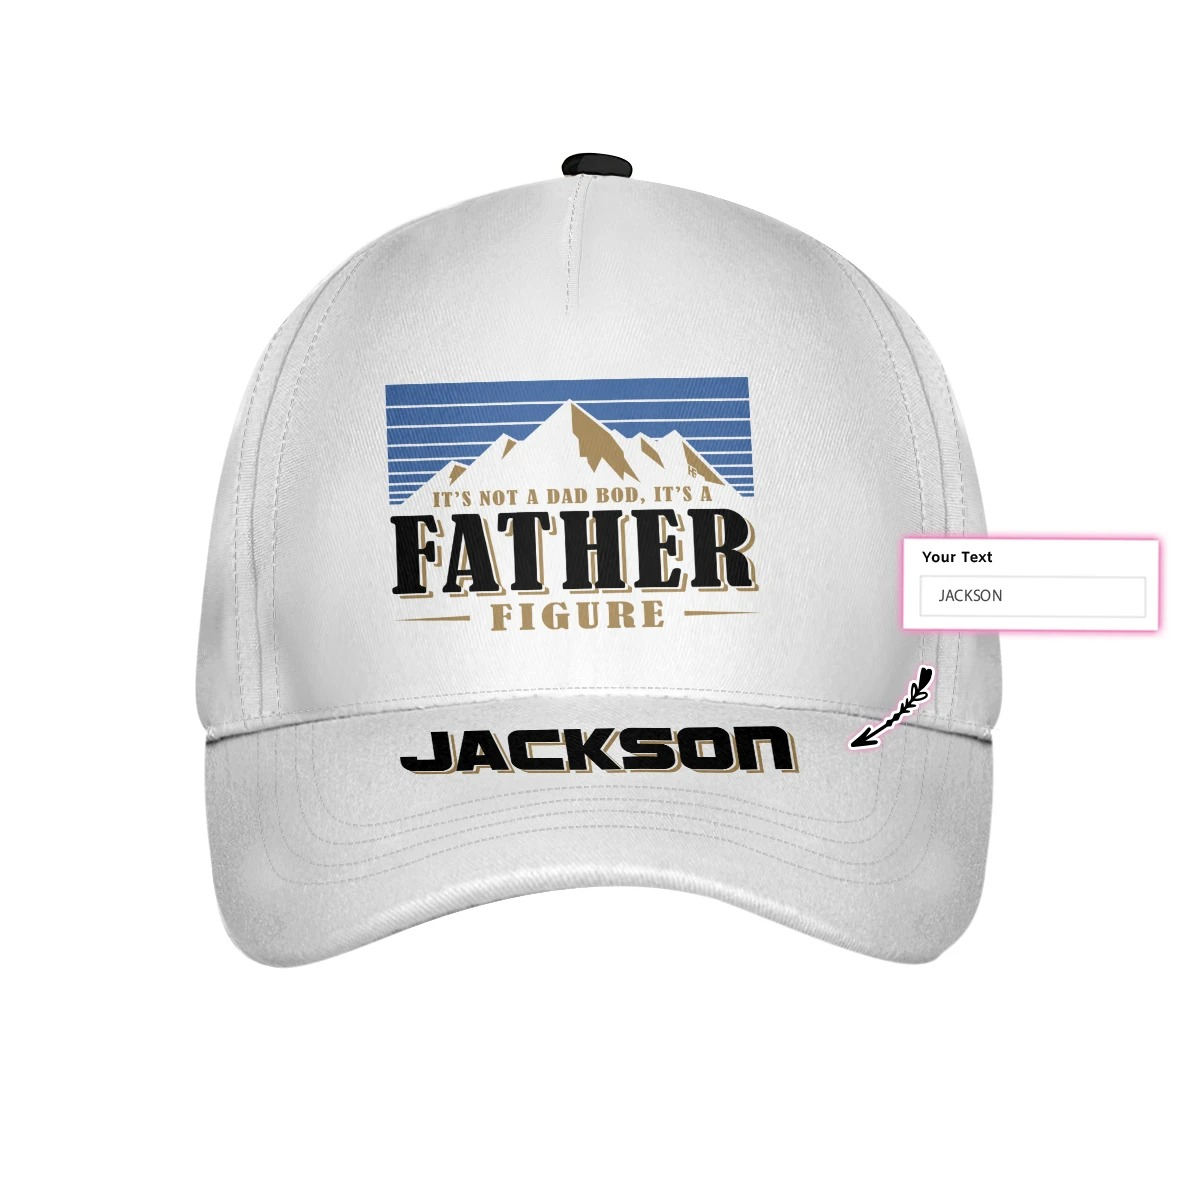 Busch light Its not a dad nod its Father figure custom name cap